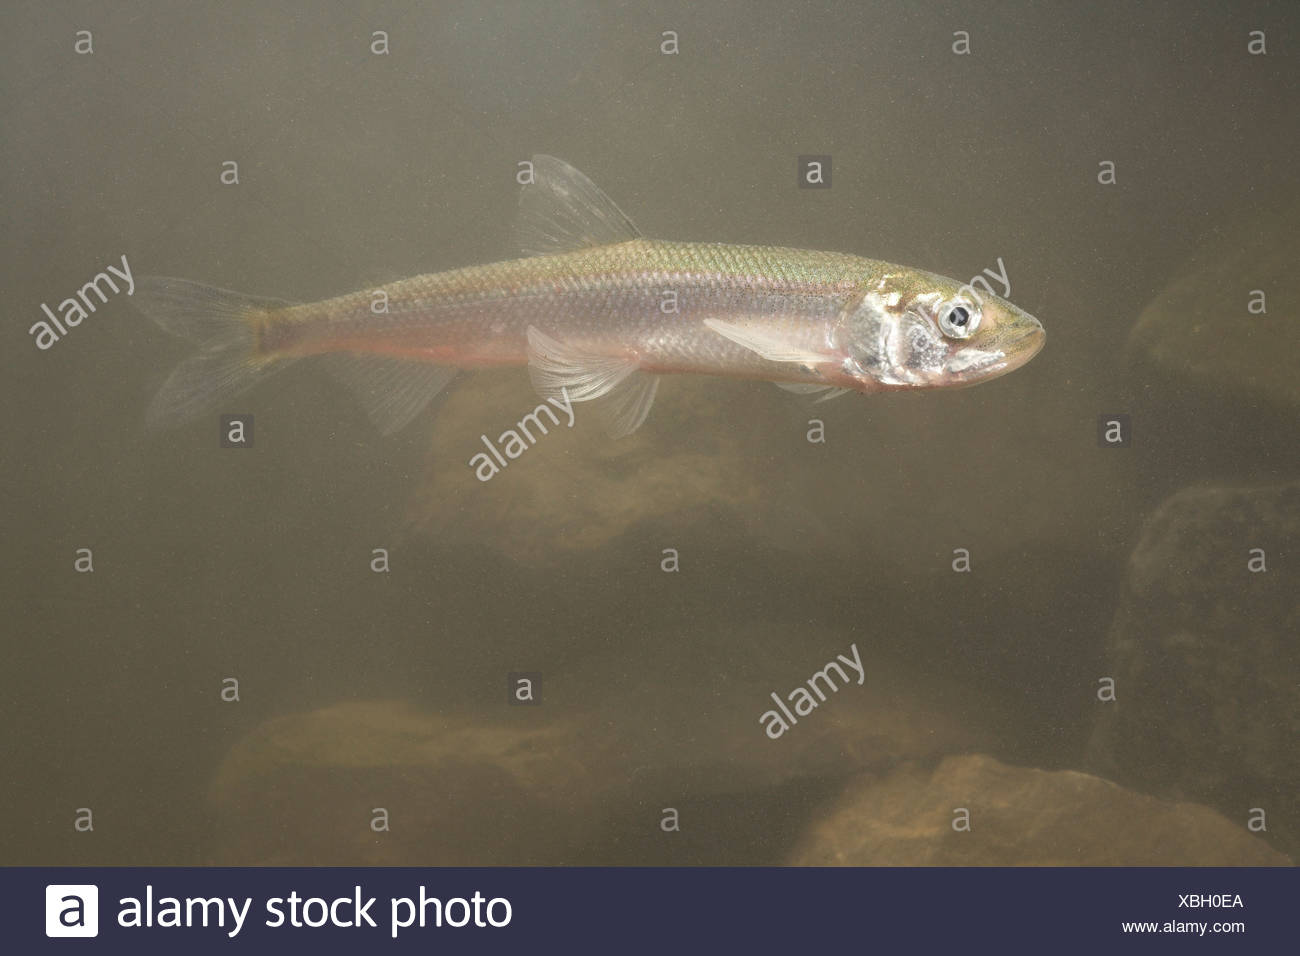 photo of a European smelt underwater Stock Photo